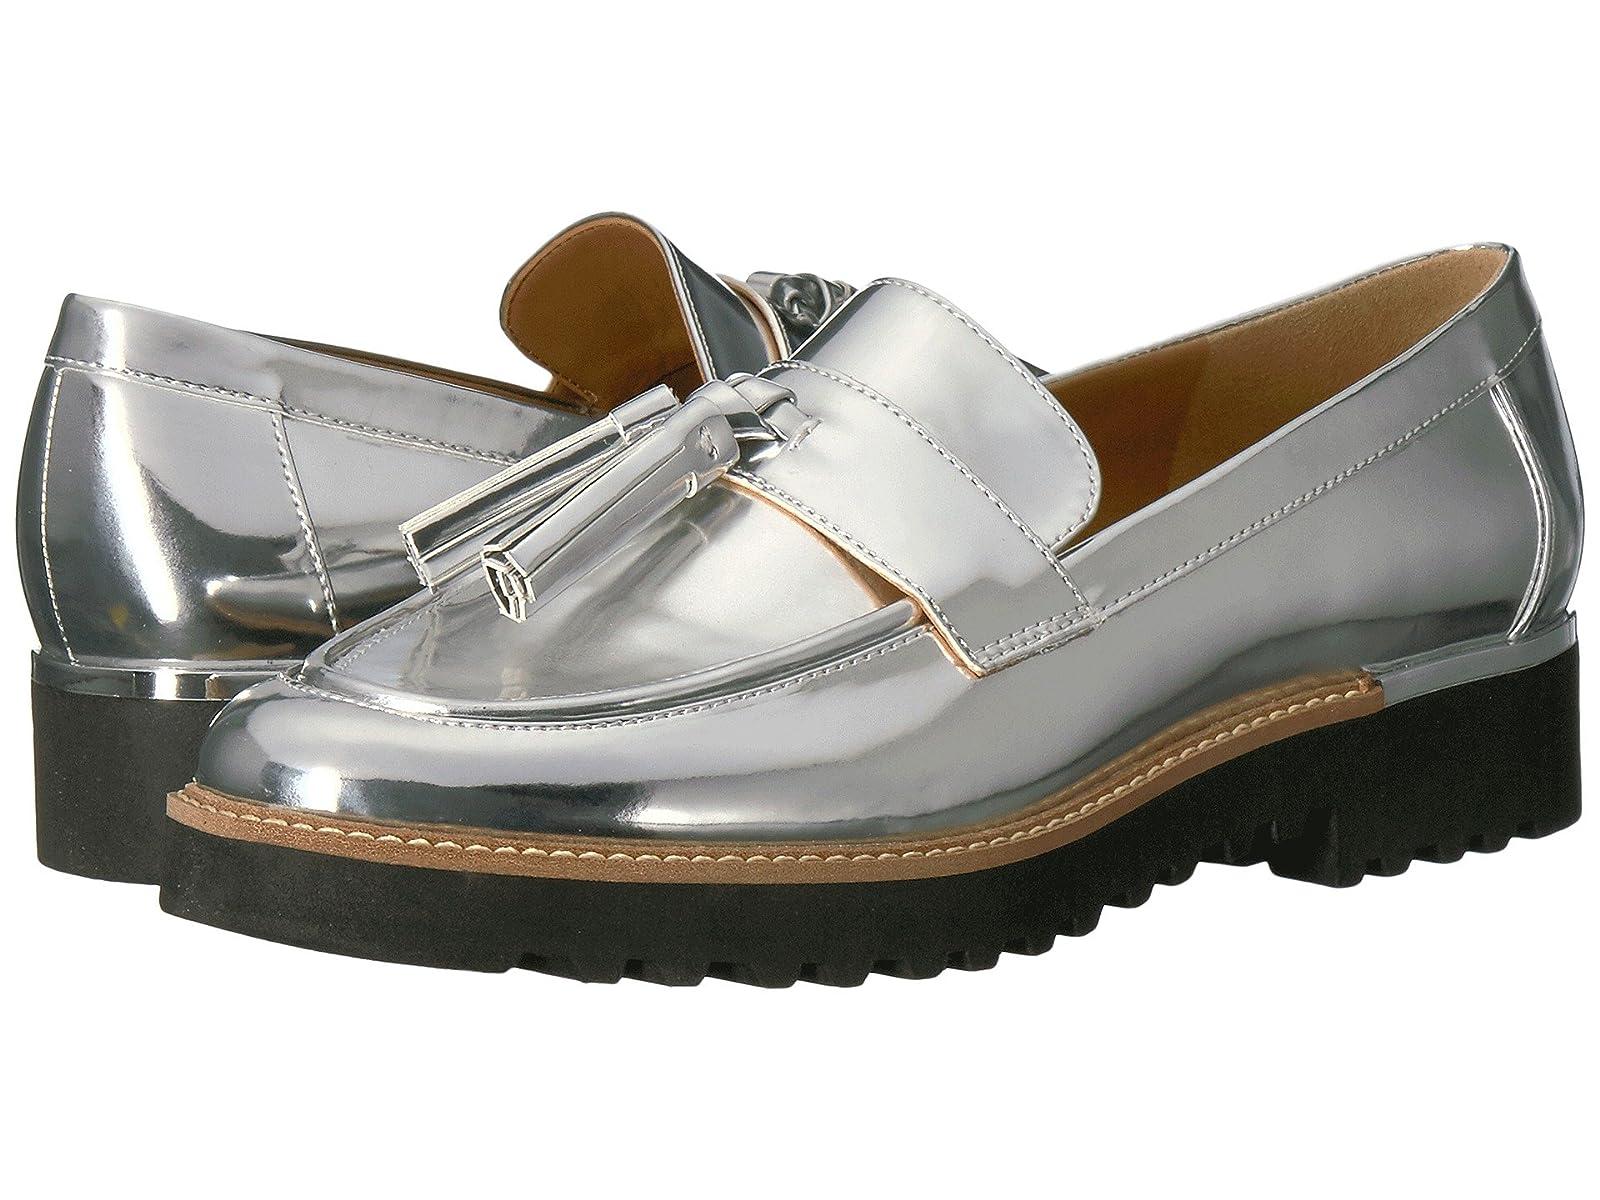 Franco Sarto CarolynnCheap and distinctive eye-catching shoes